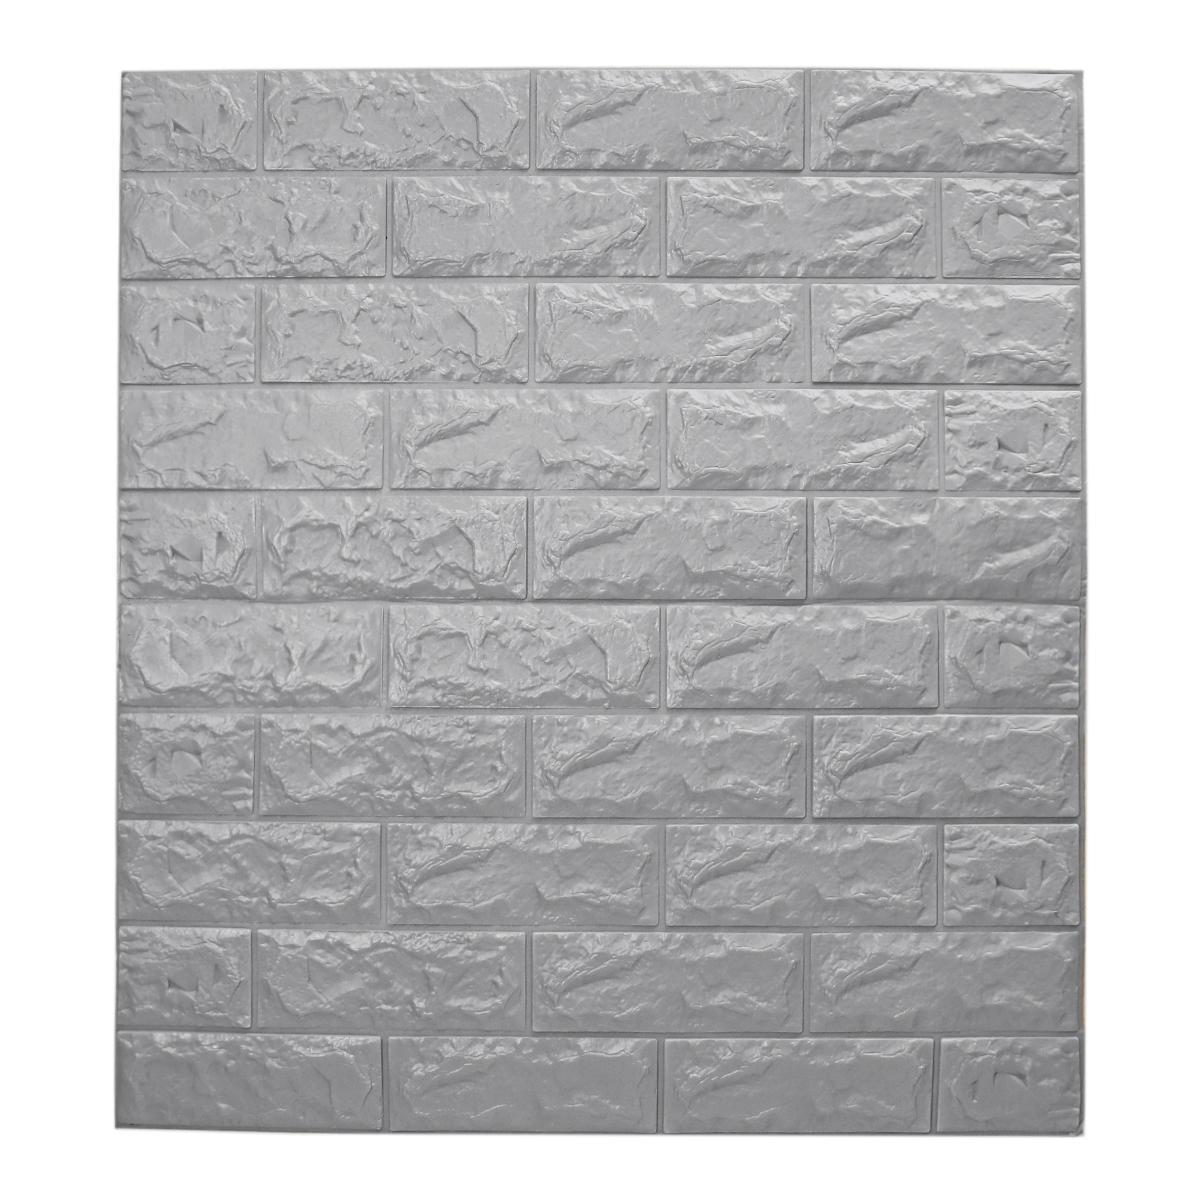 Brick Wall Sticker Tile Self-adhesive Waterproof XPE Foam Panel Home Decor UK